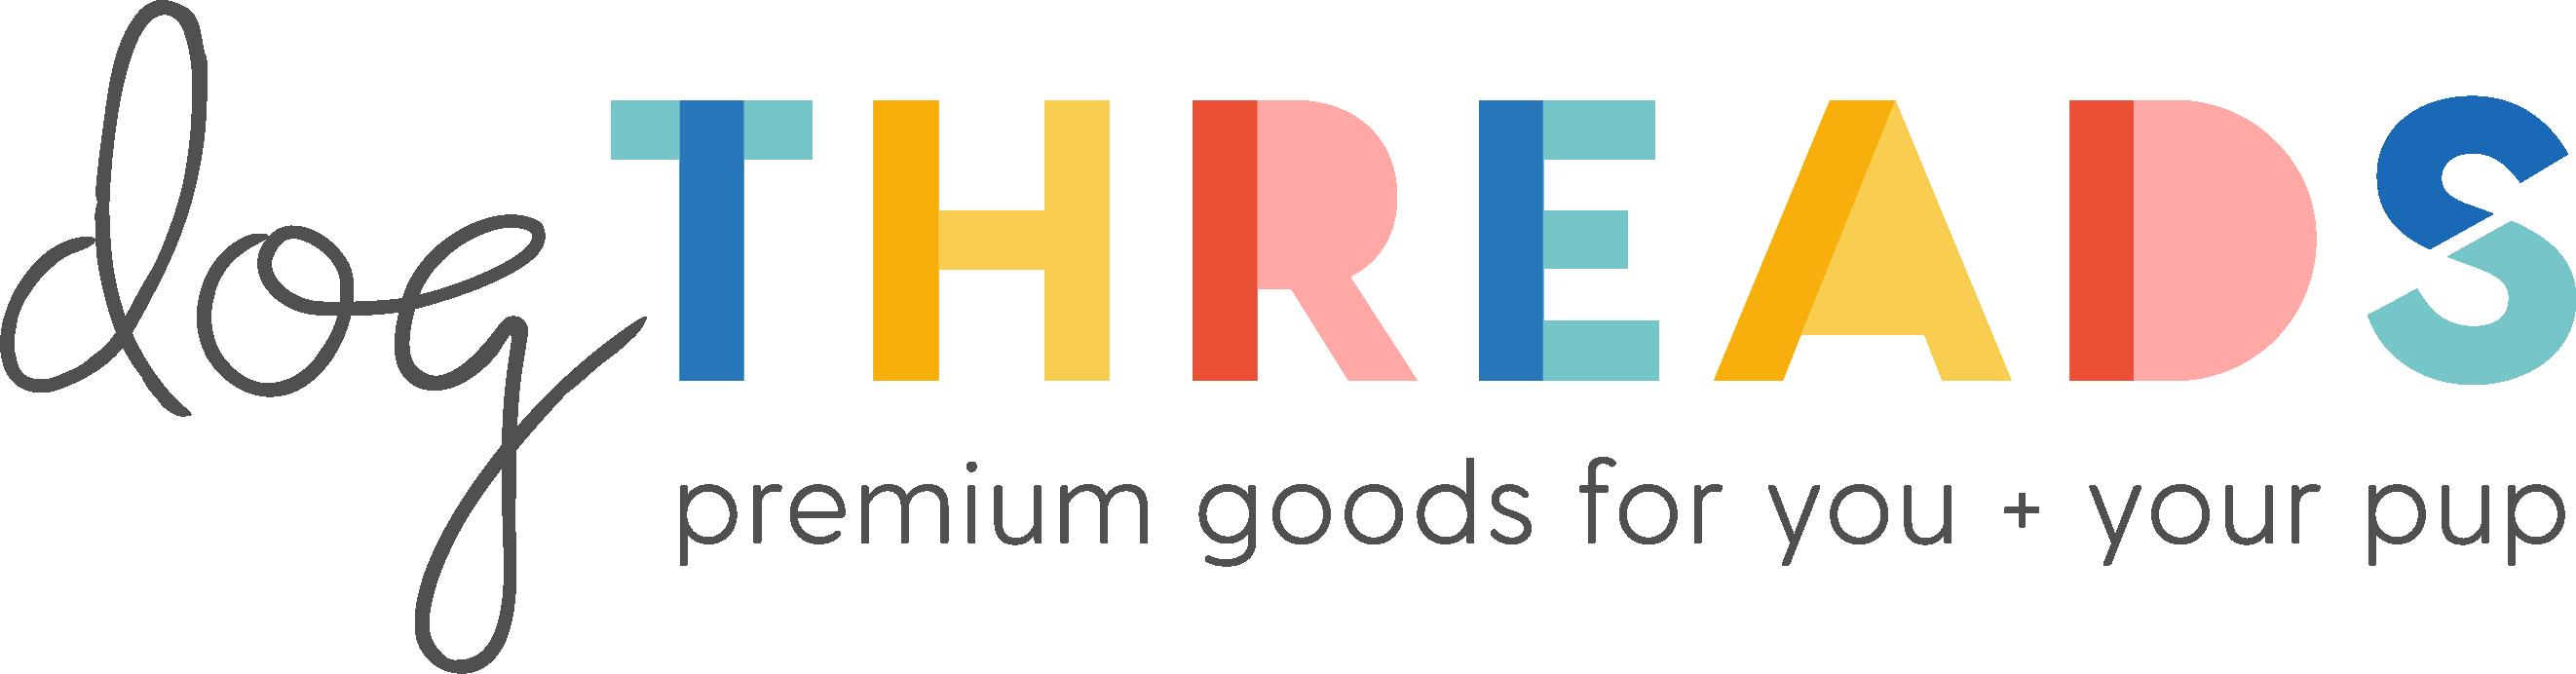 Dog Threads Logo